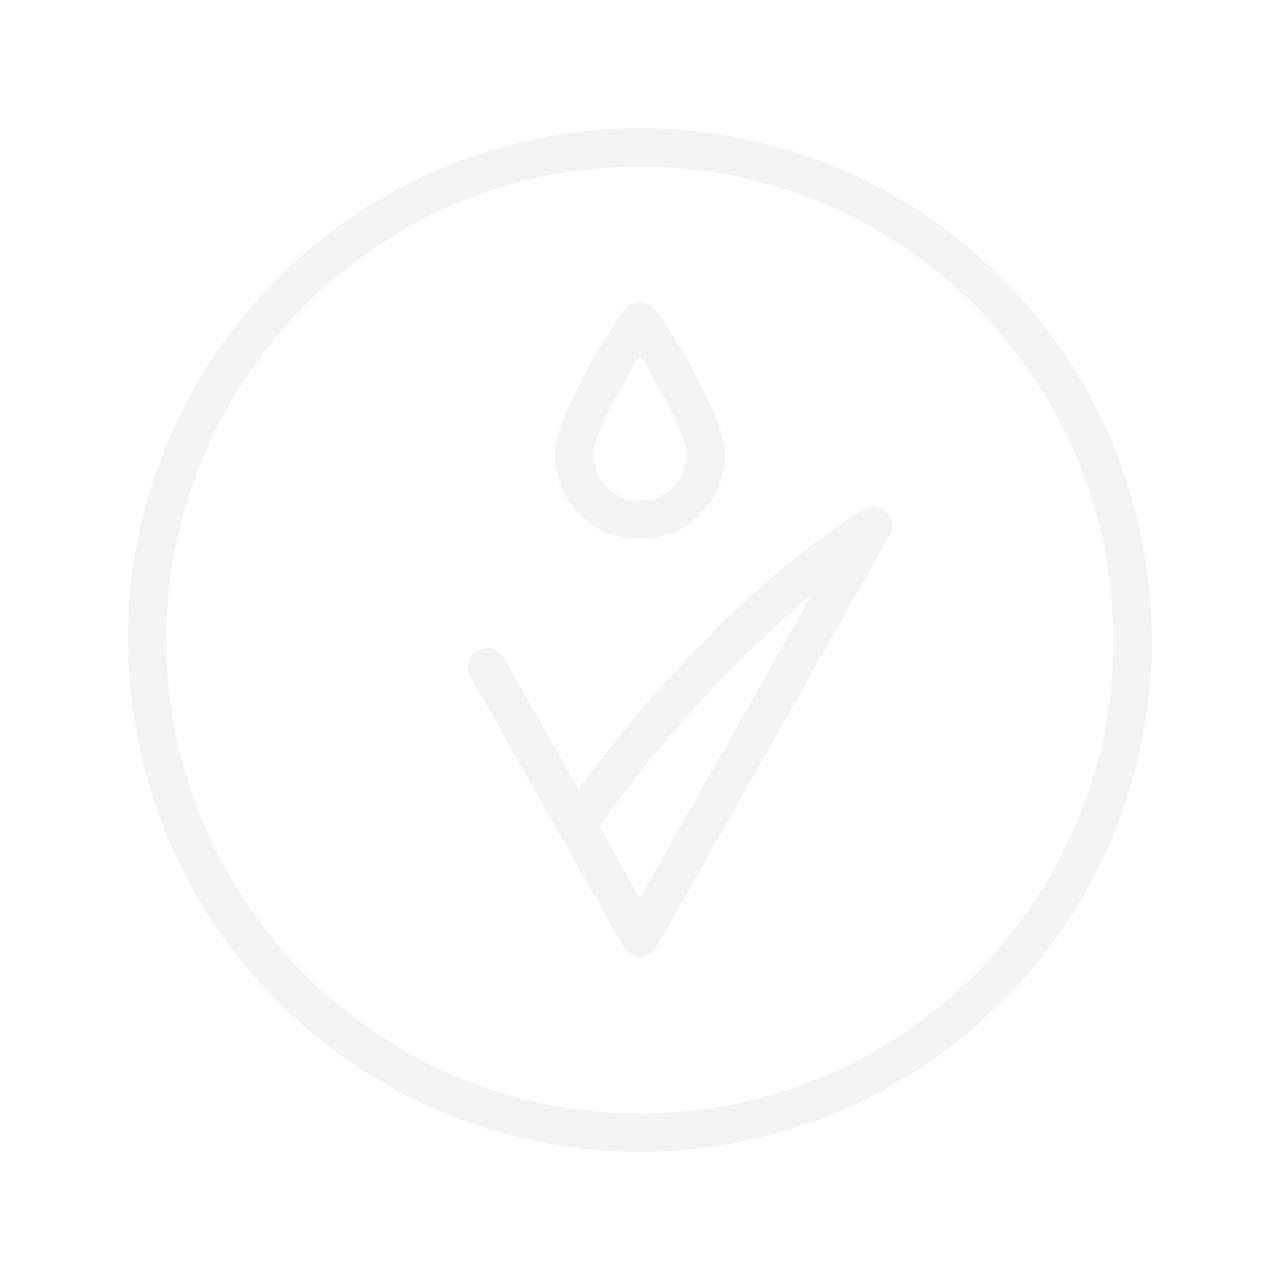 LANCOME Tresor 30ml Eau De Parfum Gift Set